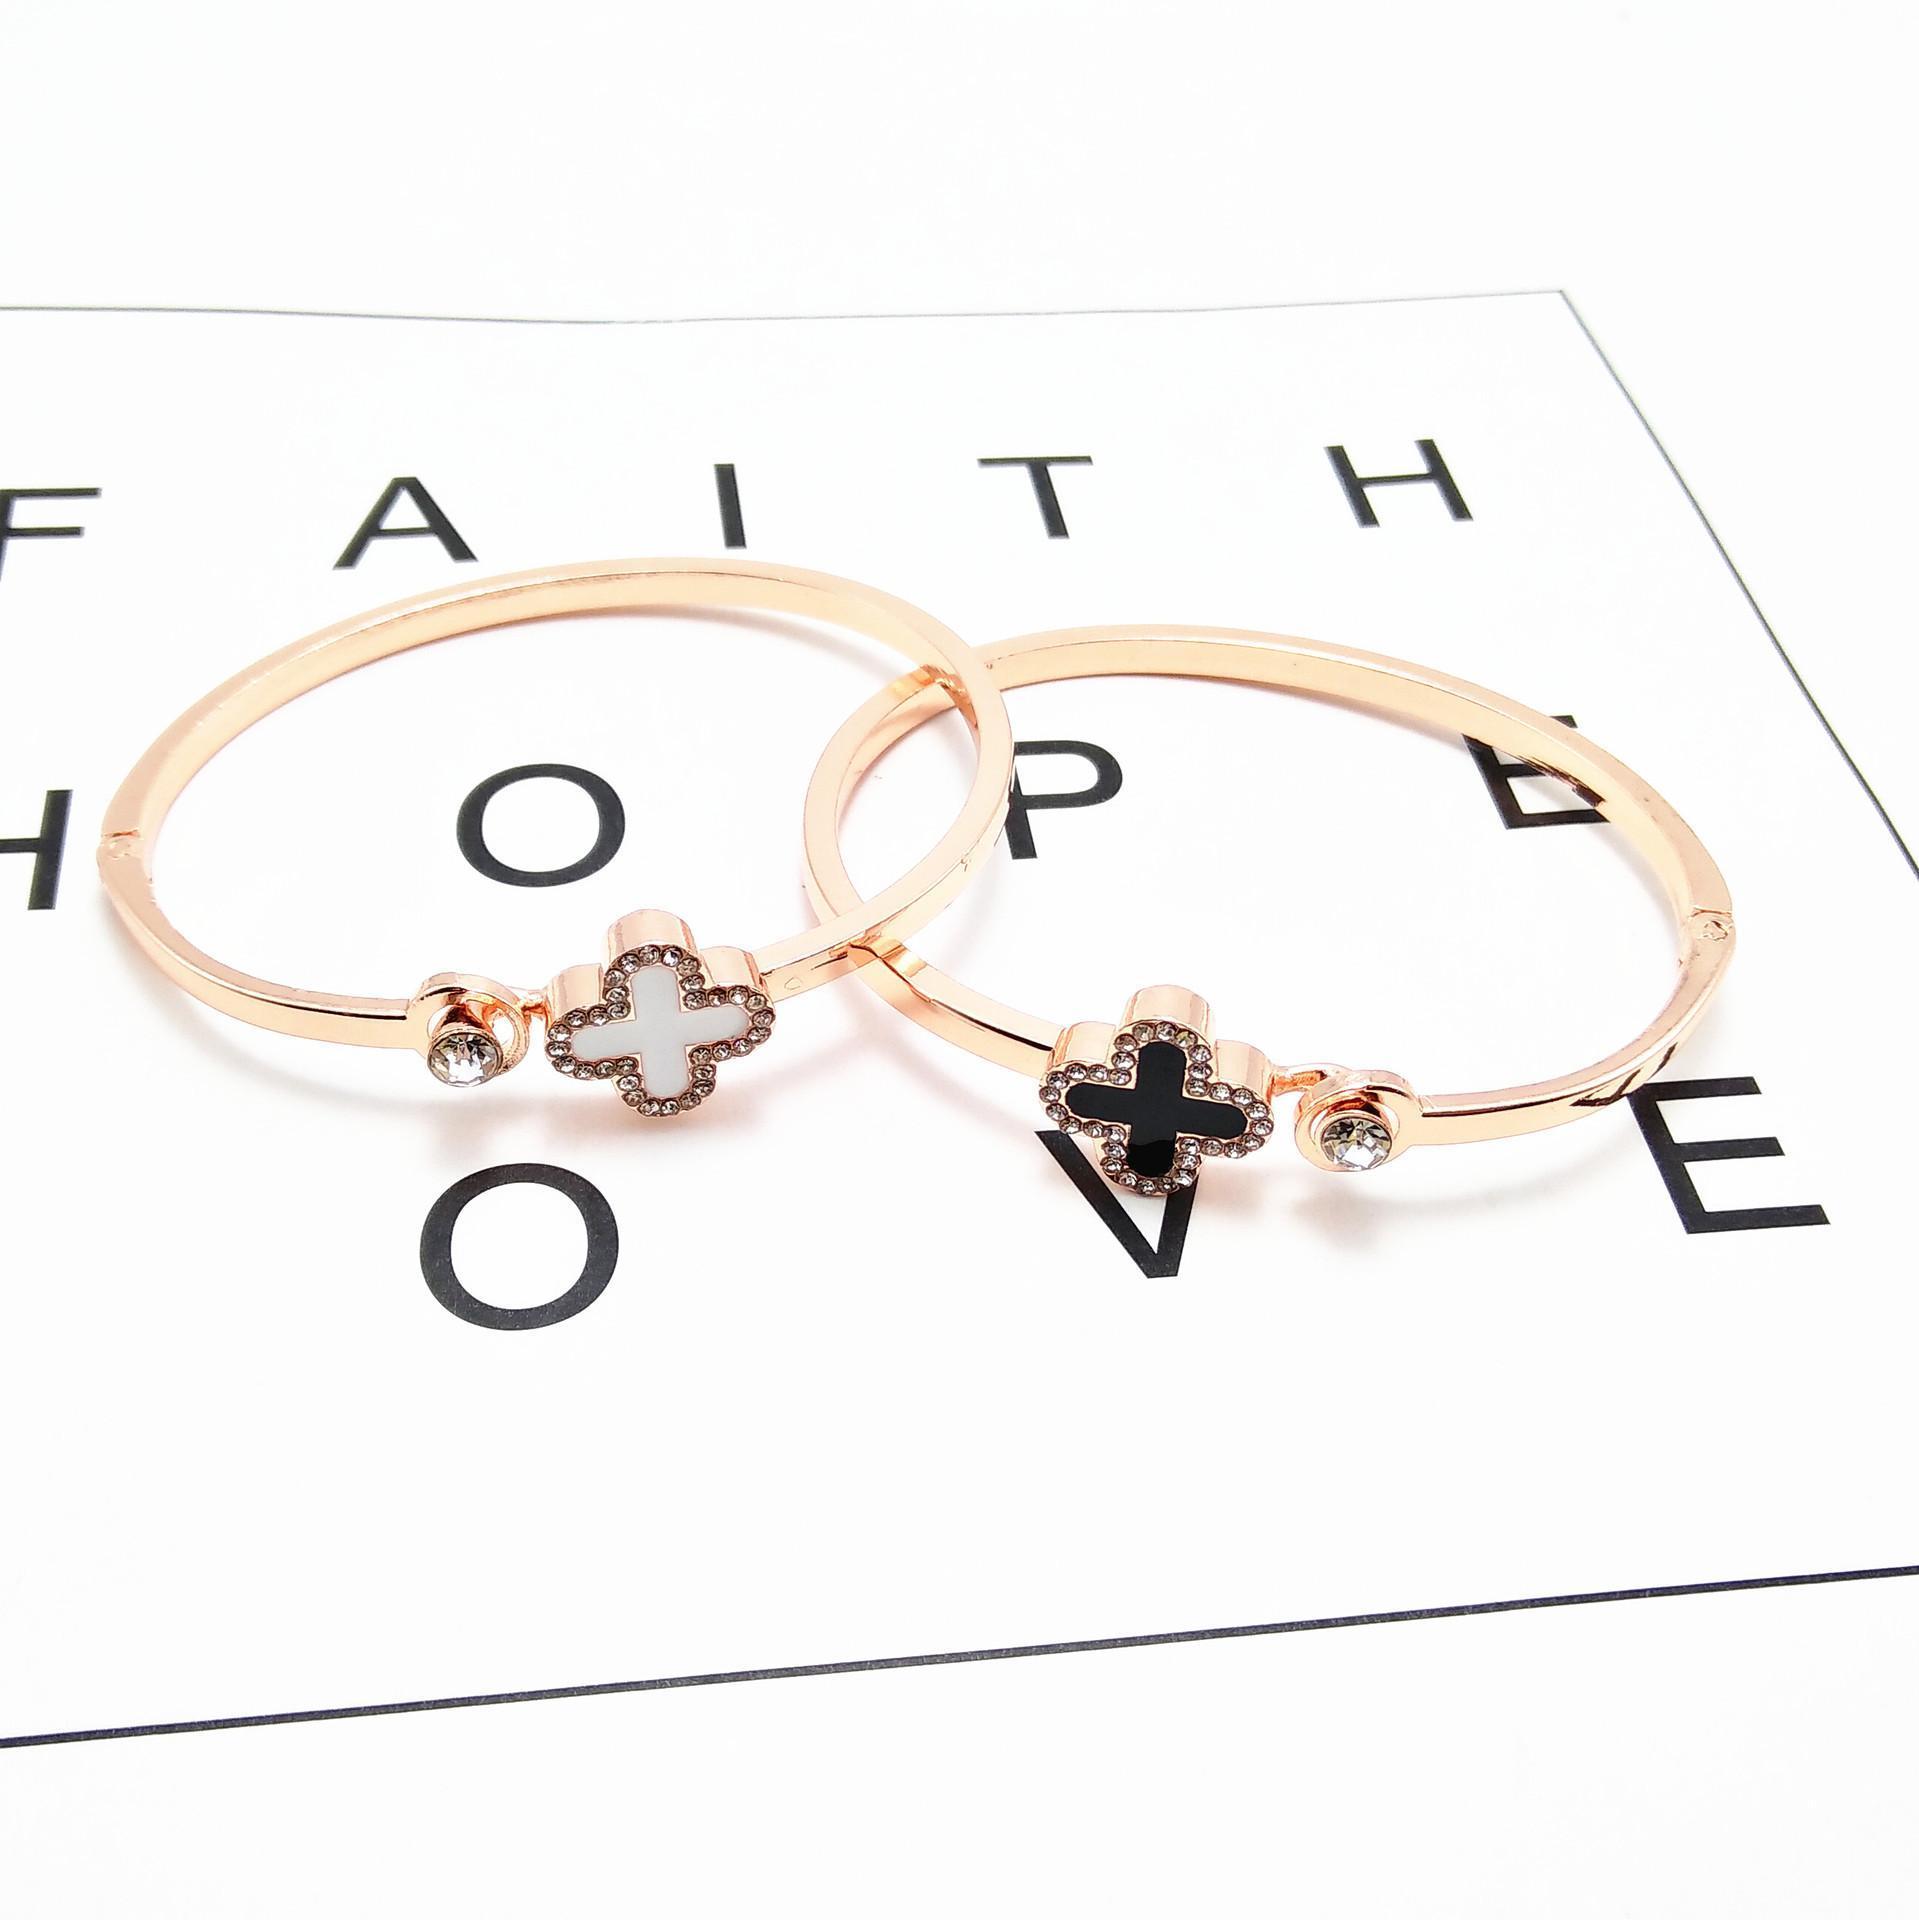 Agradável Moda Lucky Clover Bracelet Alloy Partido Ambiental Holiday Gift Rose Gold Bracelet selvagem Abertura pulseira Popular